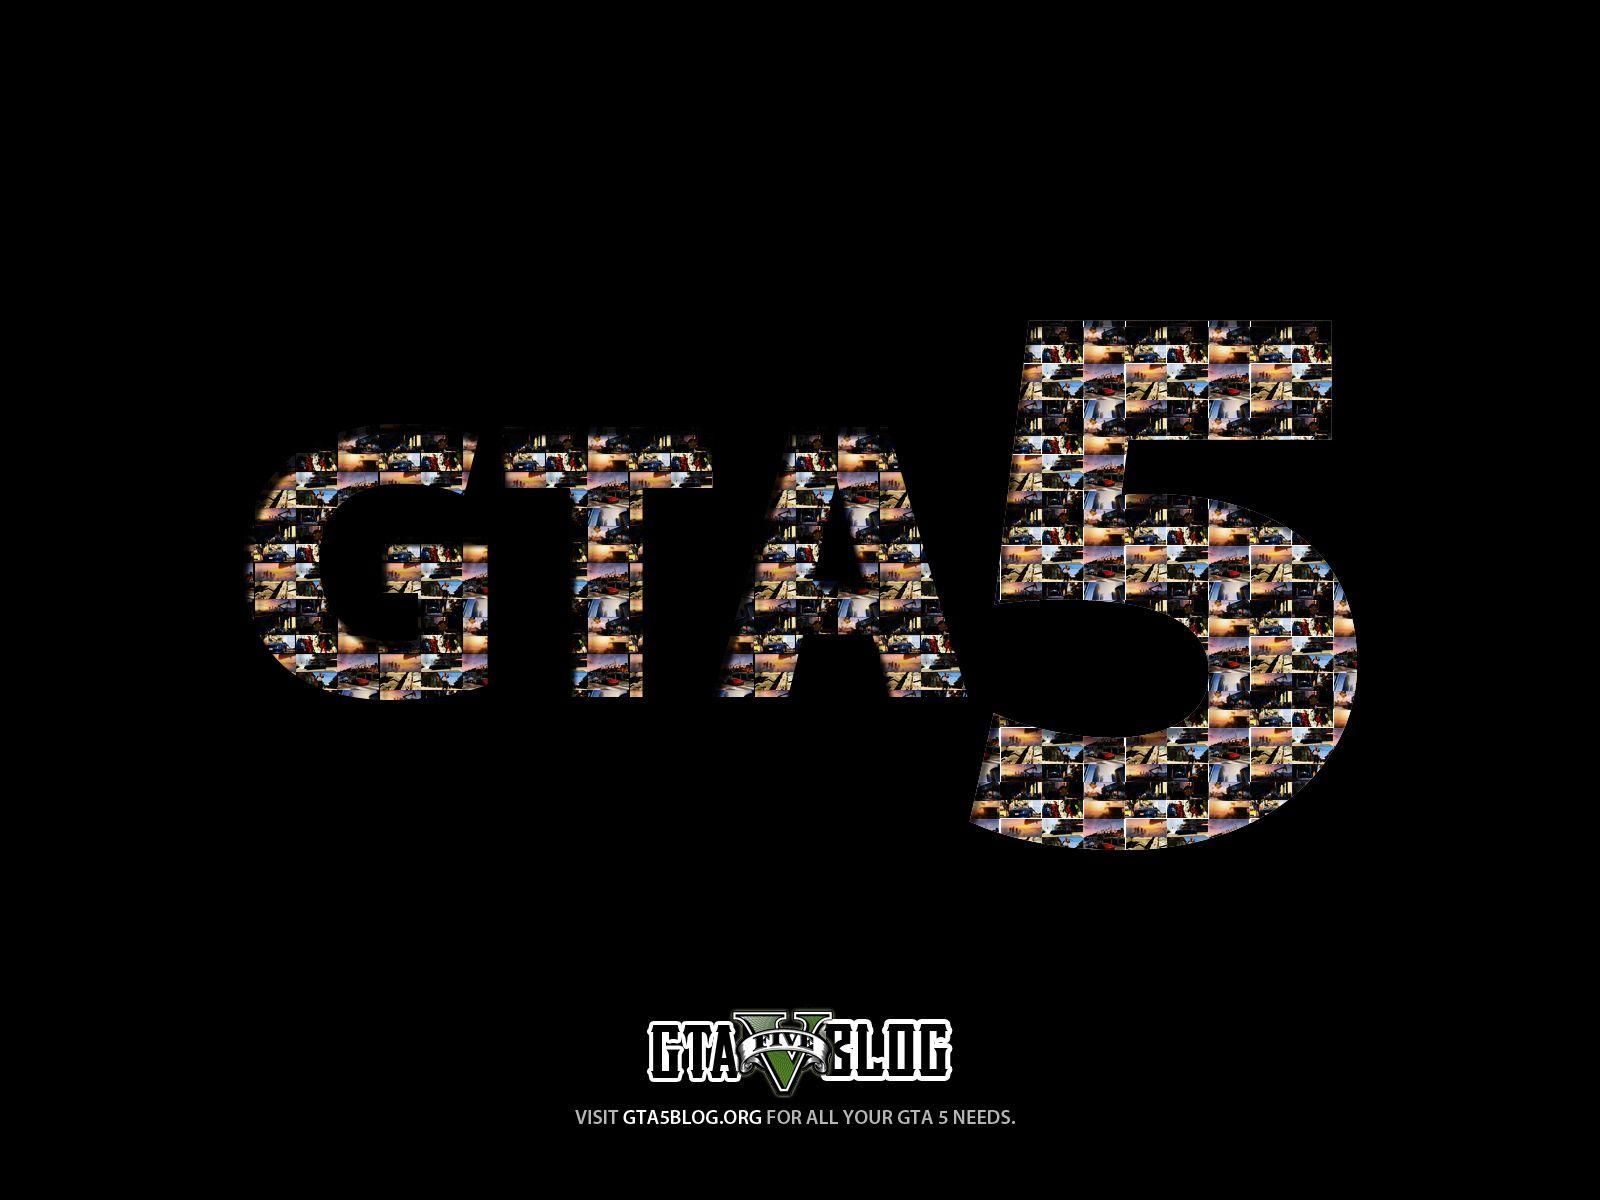 Game Grand Theft Auto V Wallpaper 037